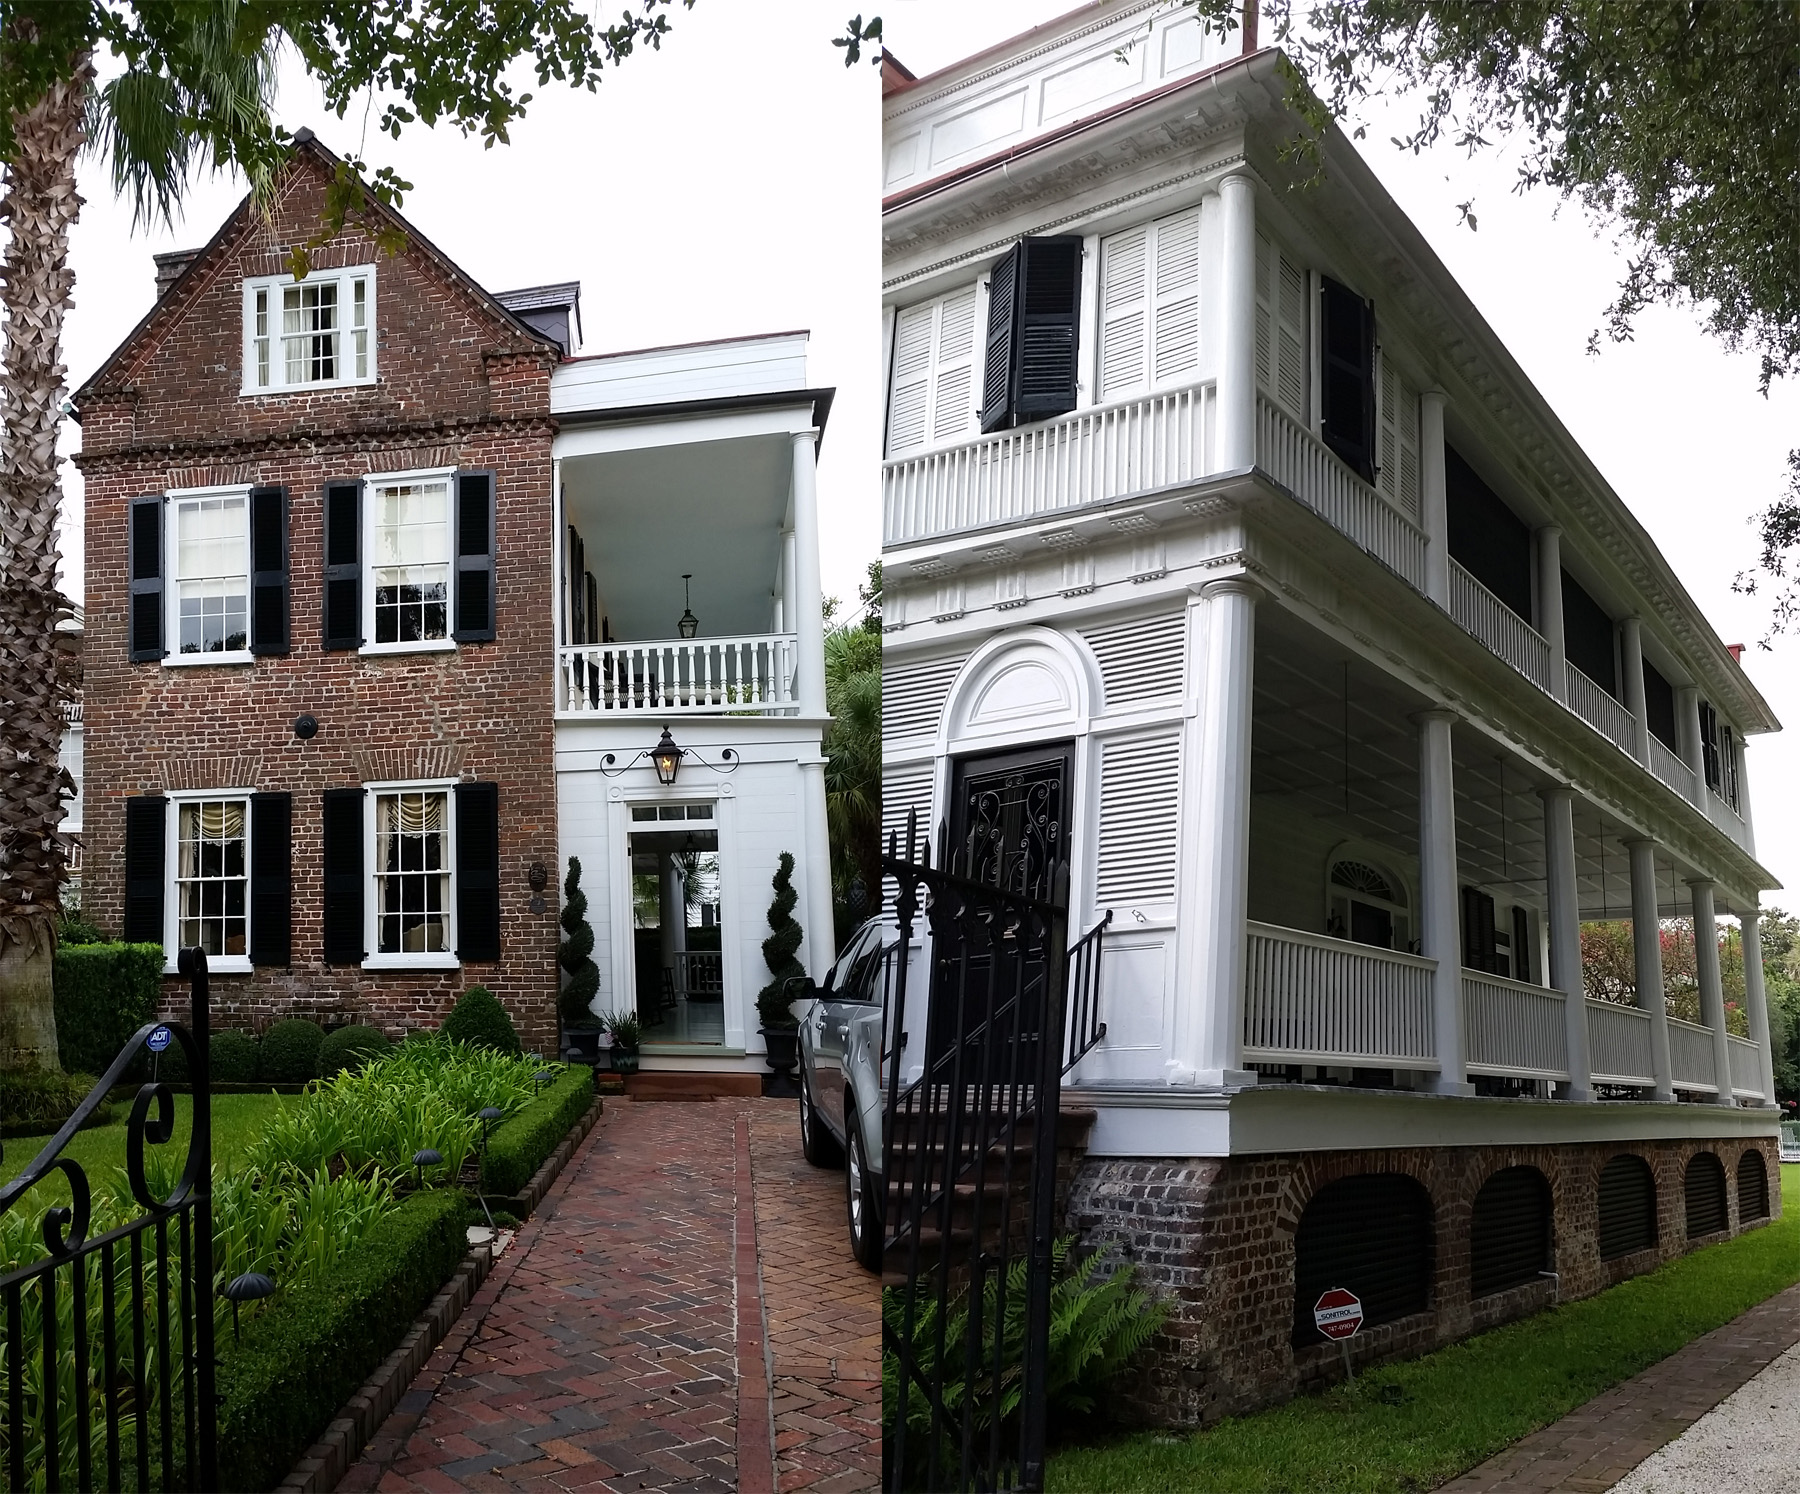 Residential Design: Residential Design Inspiration: The Porch